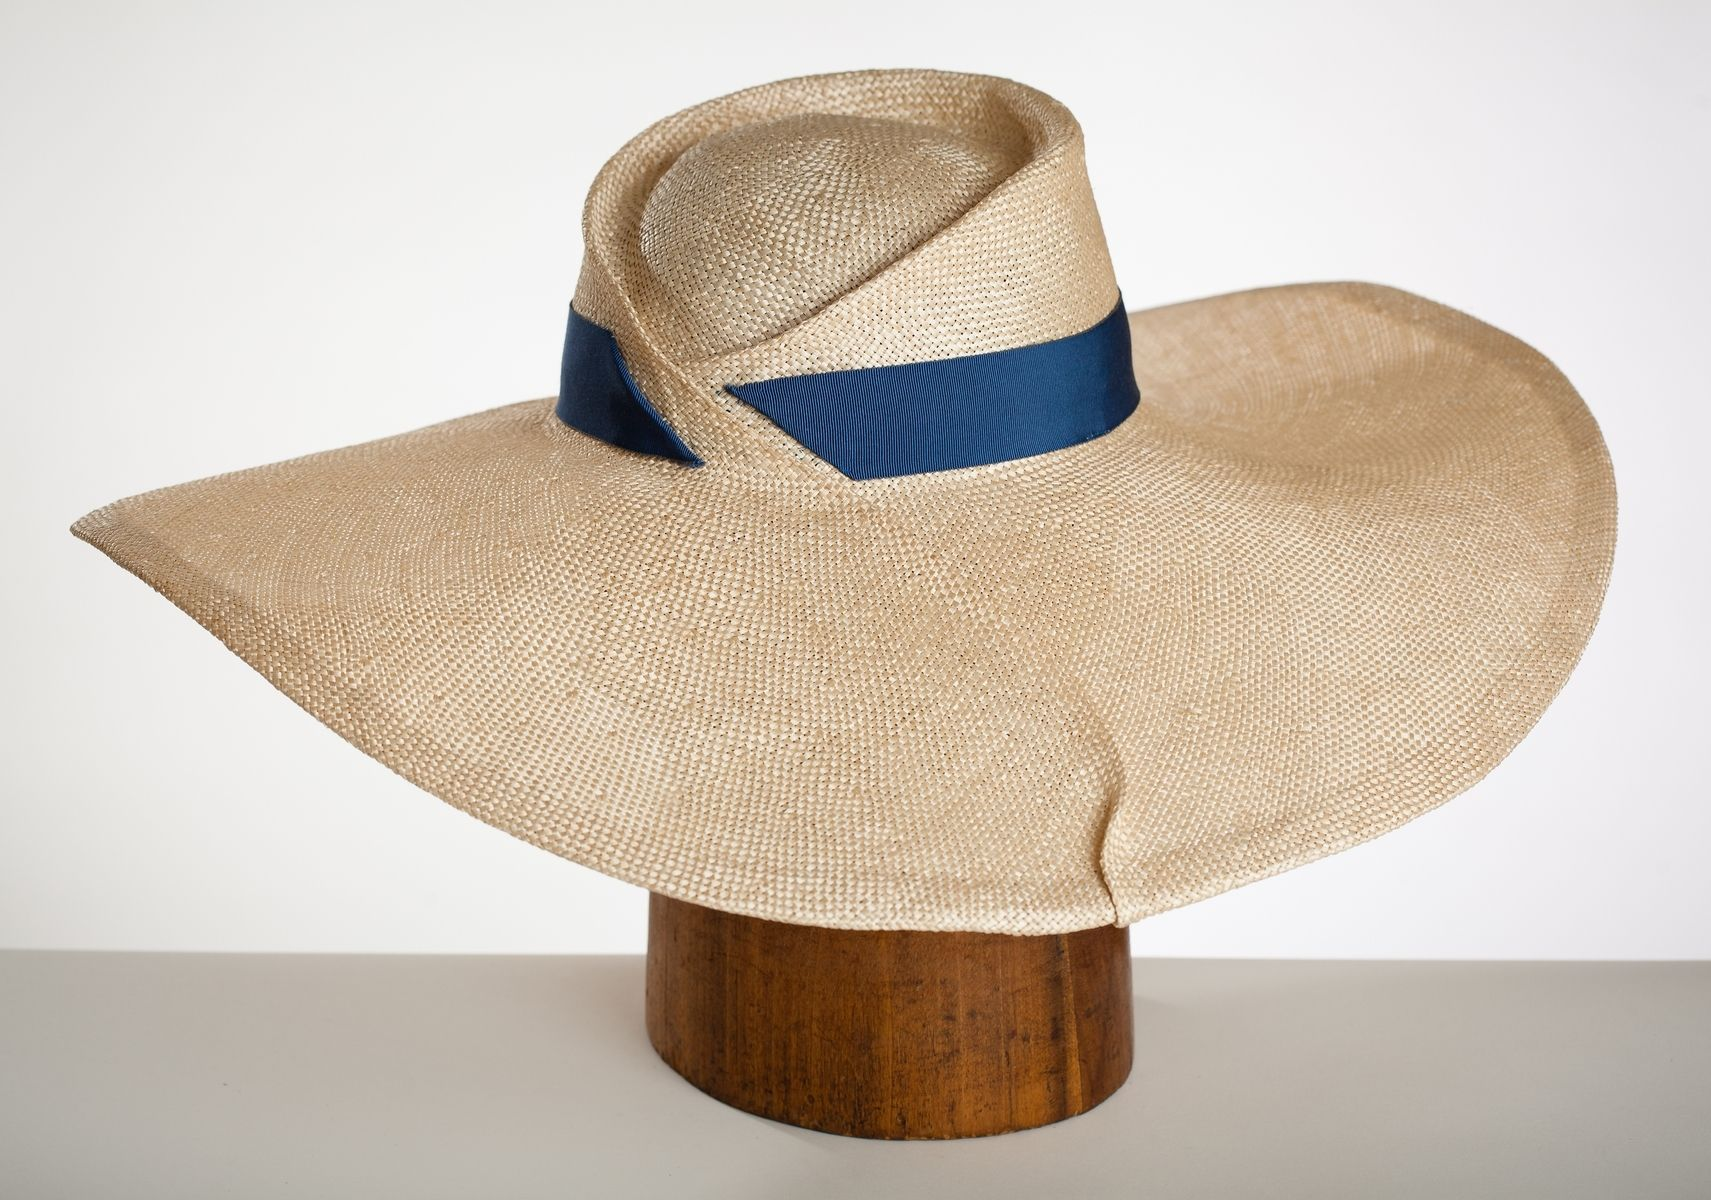 Hand Made Elegant Large Brimmed Straw Hat  Gatsby  by Corina Haywood ... 1227c0adc956